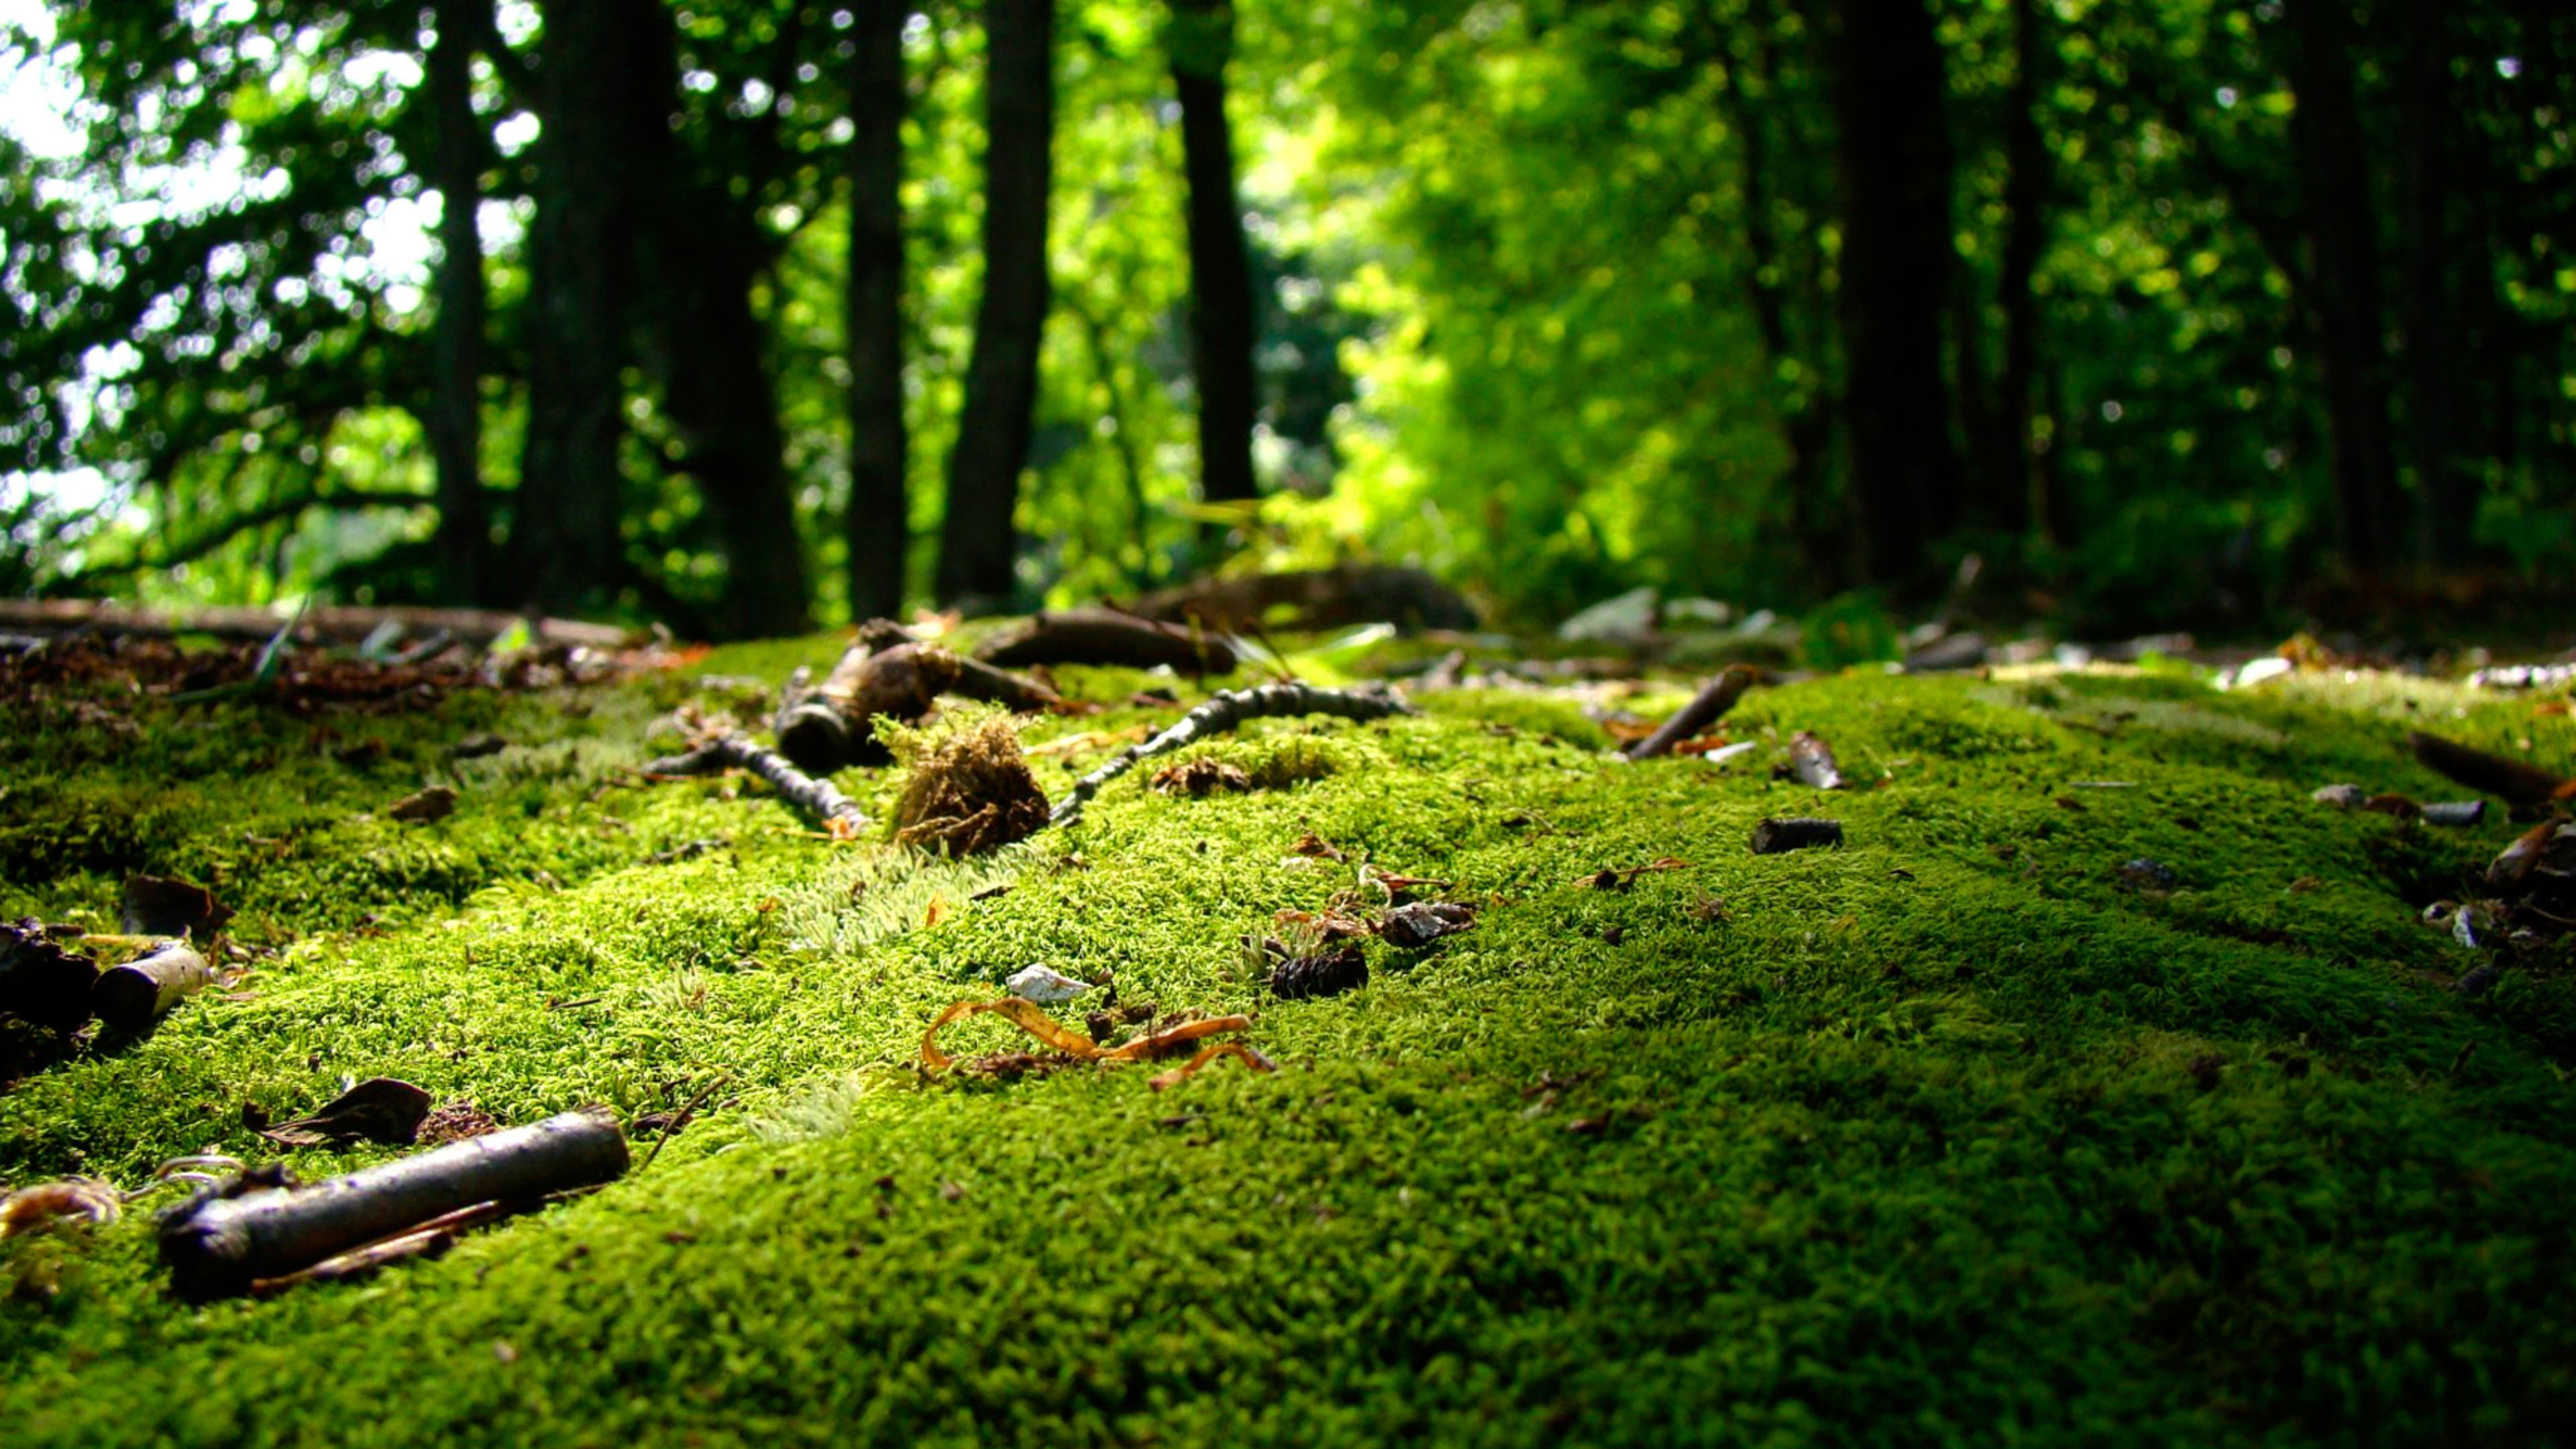 Res: 3840x2160, Inspiring Spring Nature 4K Wallpaper